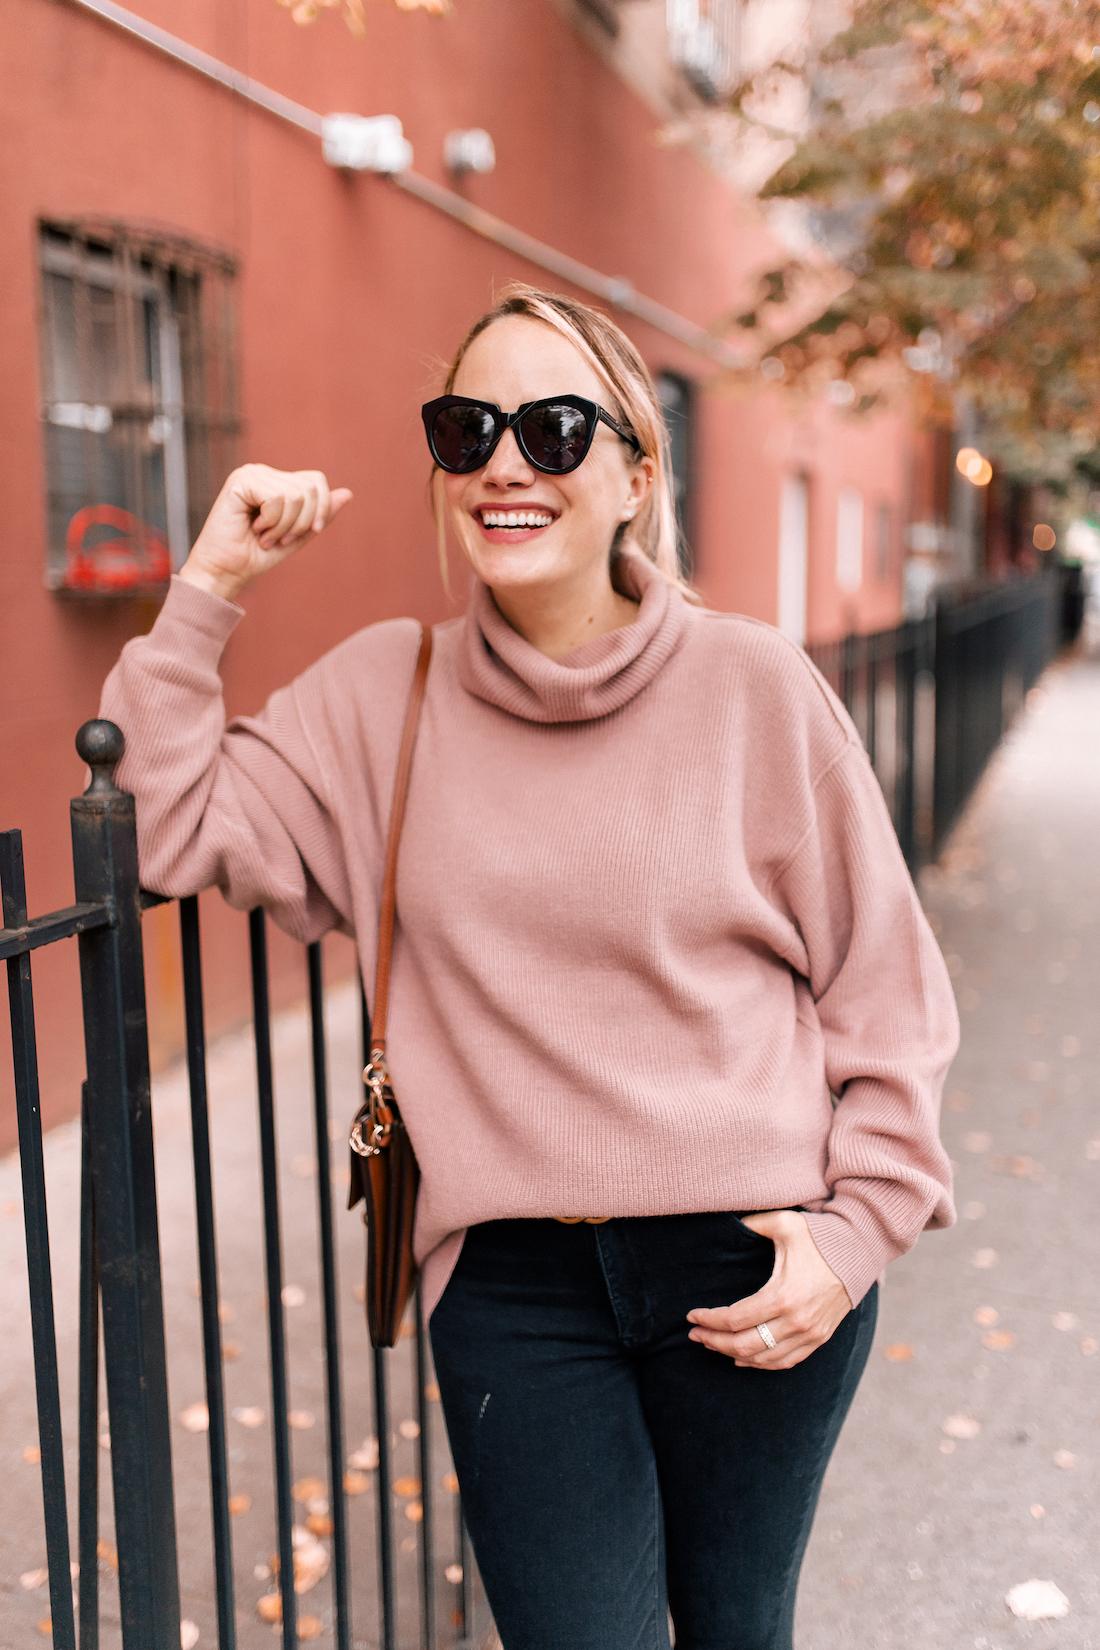 Free People Softly Structured Tunic Sweater //American Eagle Jeans // Gucci Belt  //Karen Walker Sunglasses //Charlotte Tilbury Lipstick